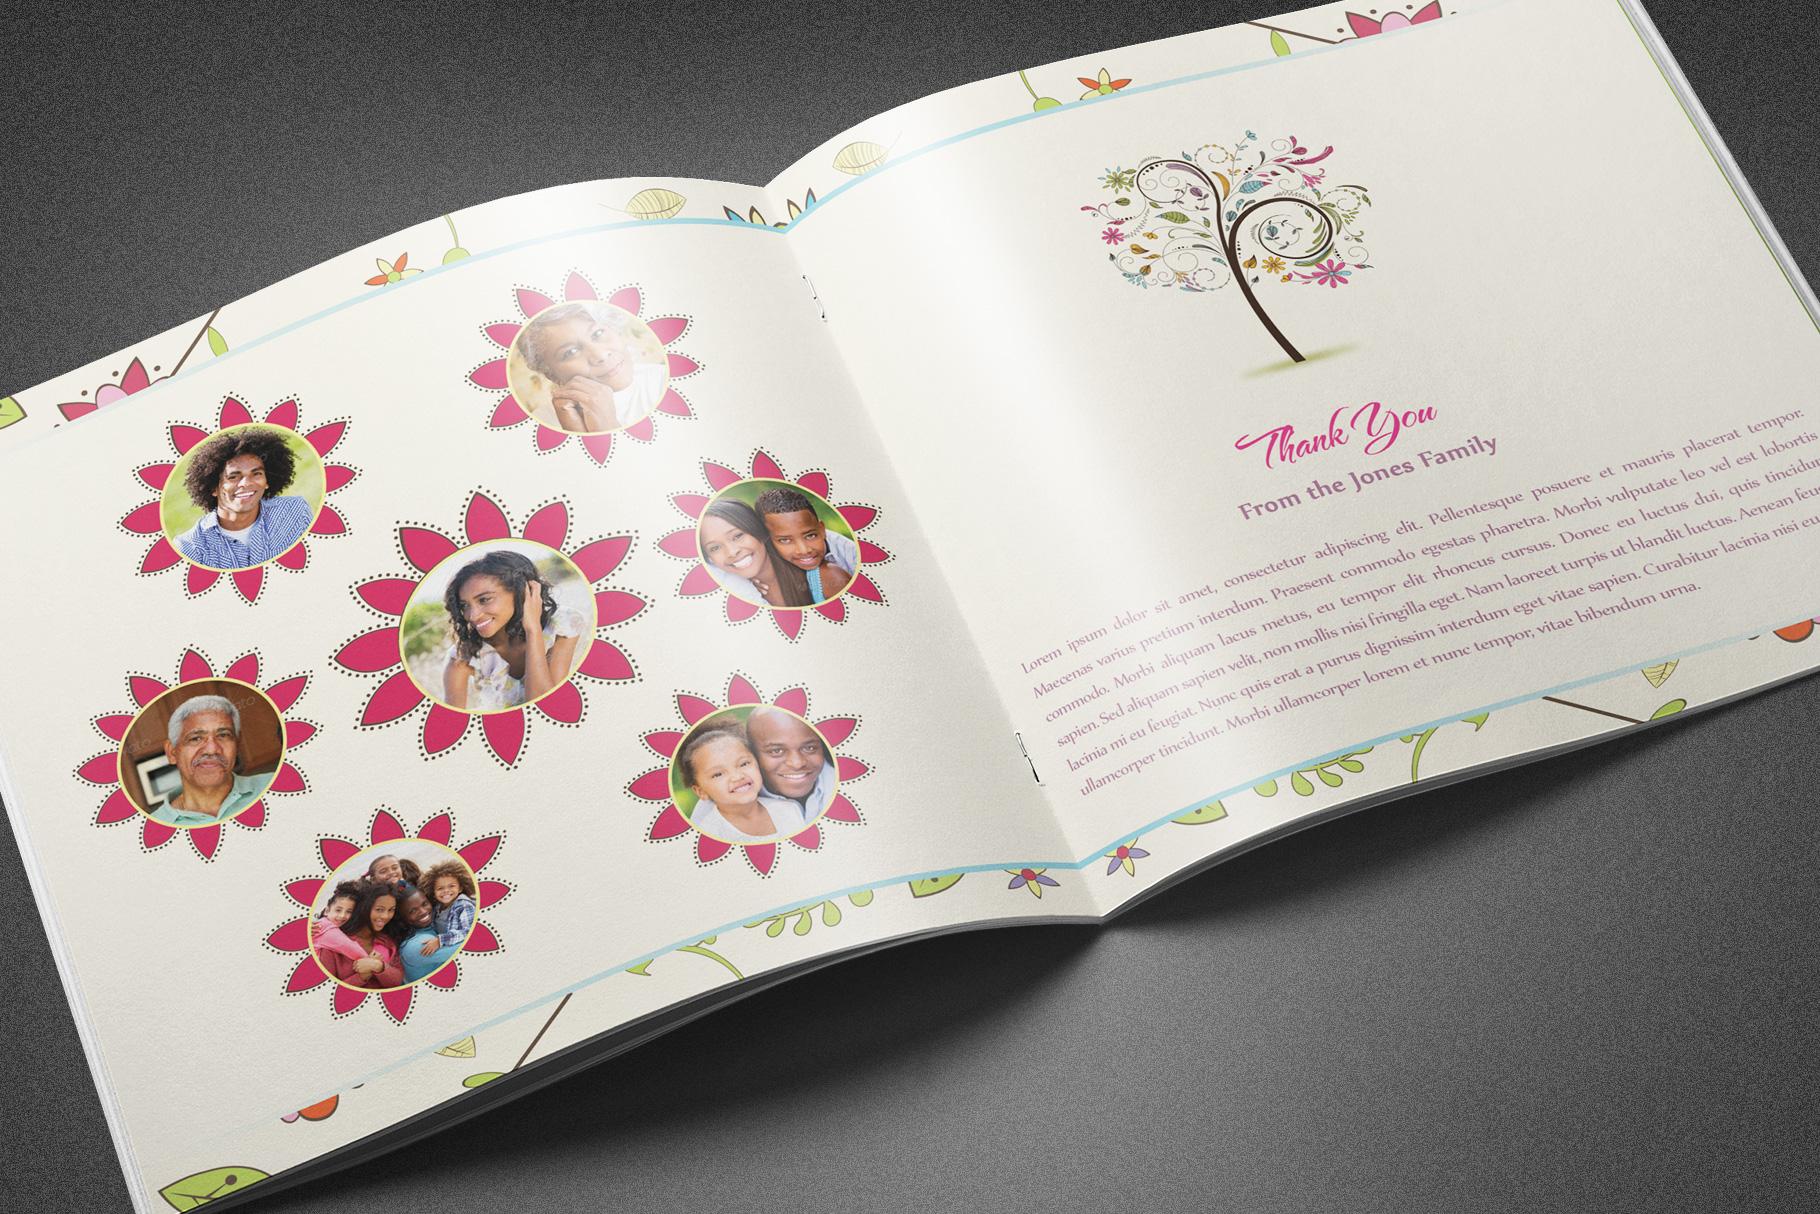 Floral Dreams Funeral Program example image 5